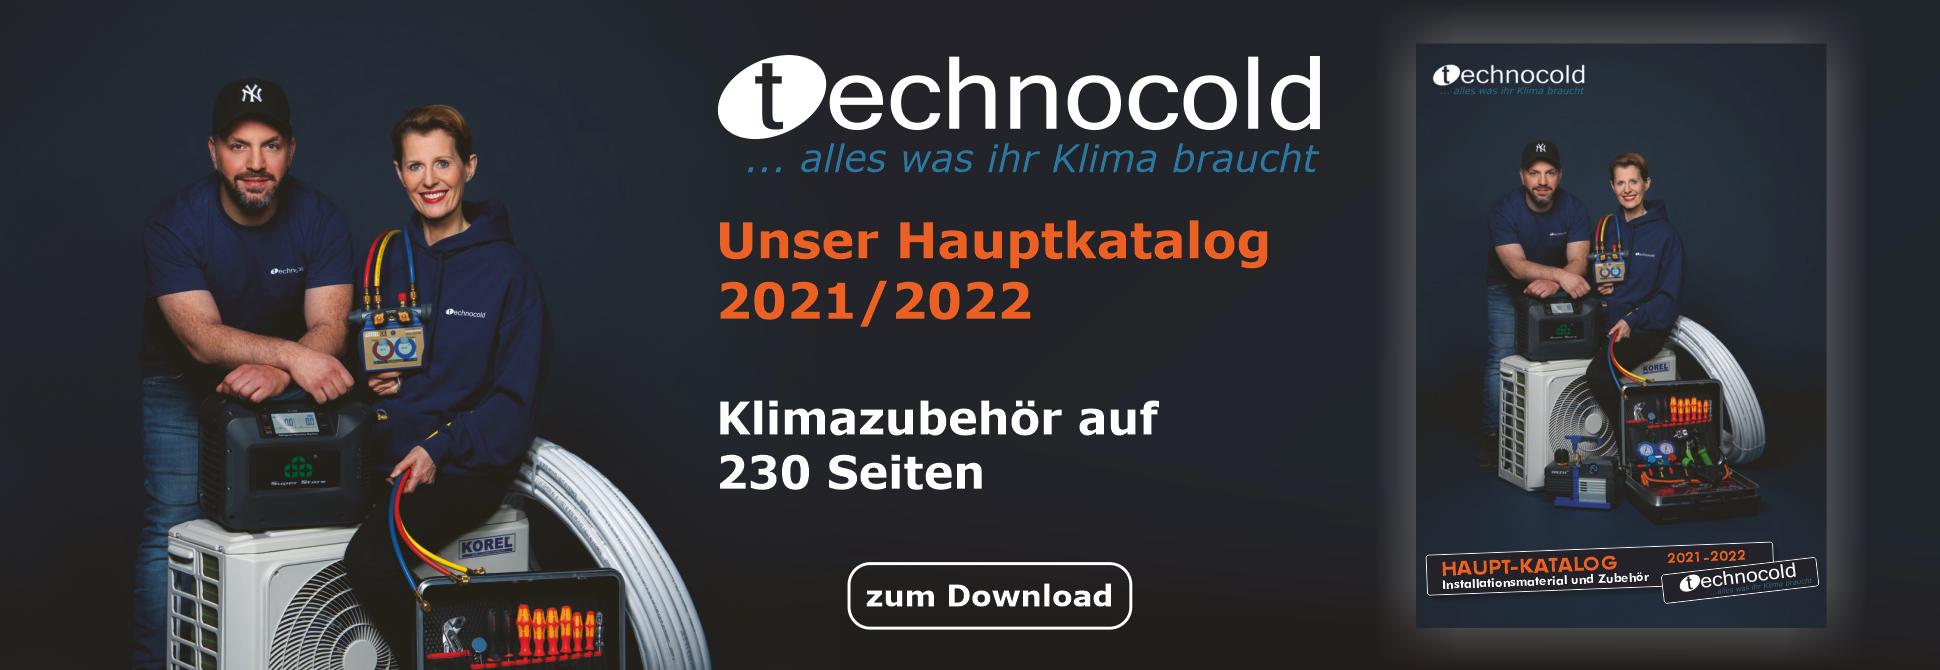 Hauptkatalog 2021/2022